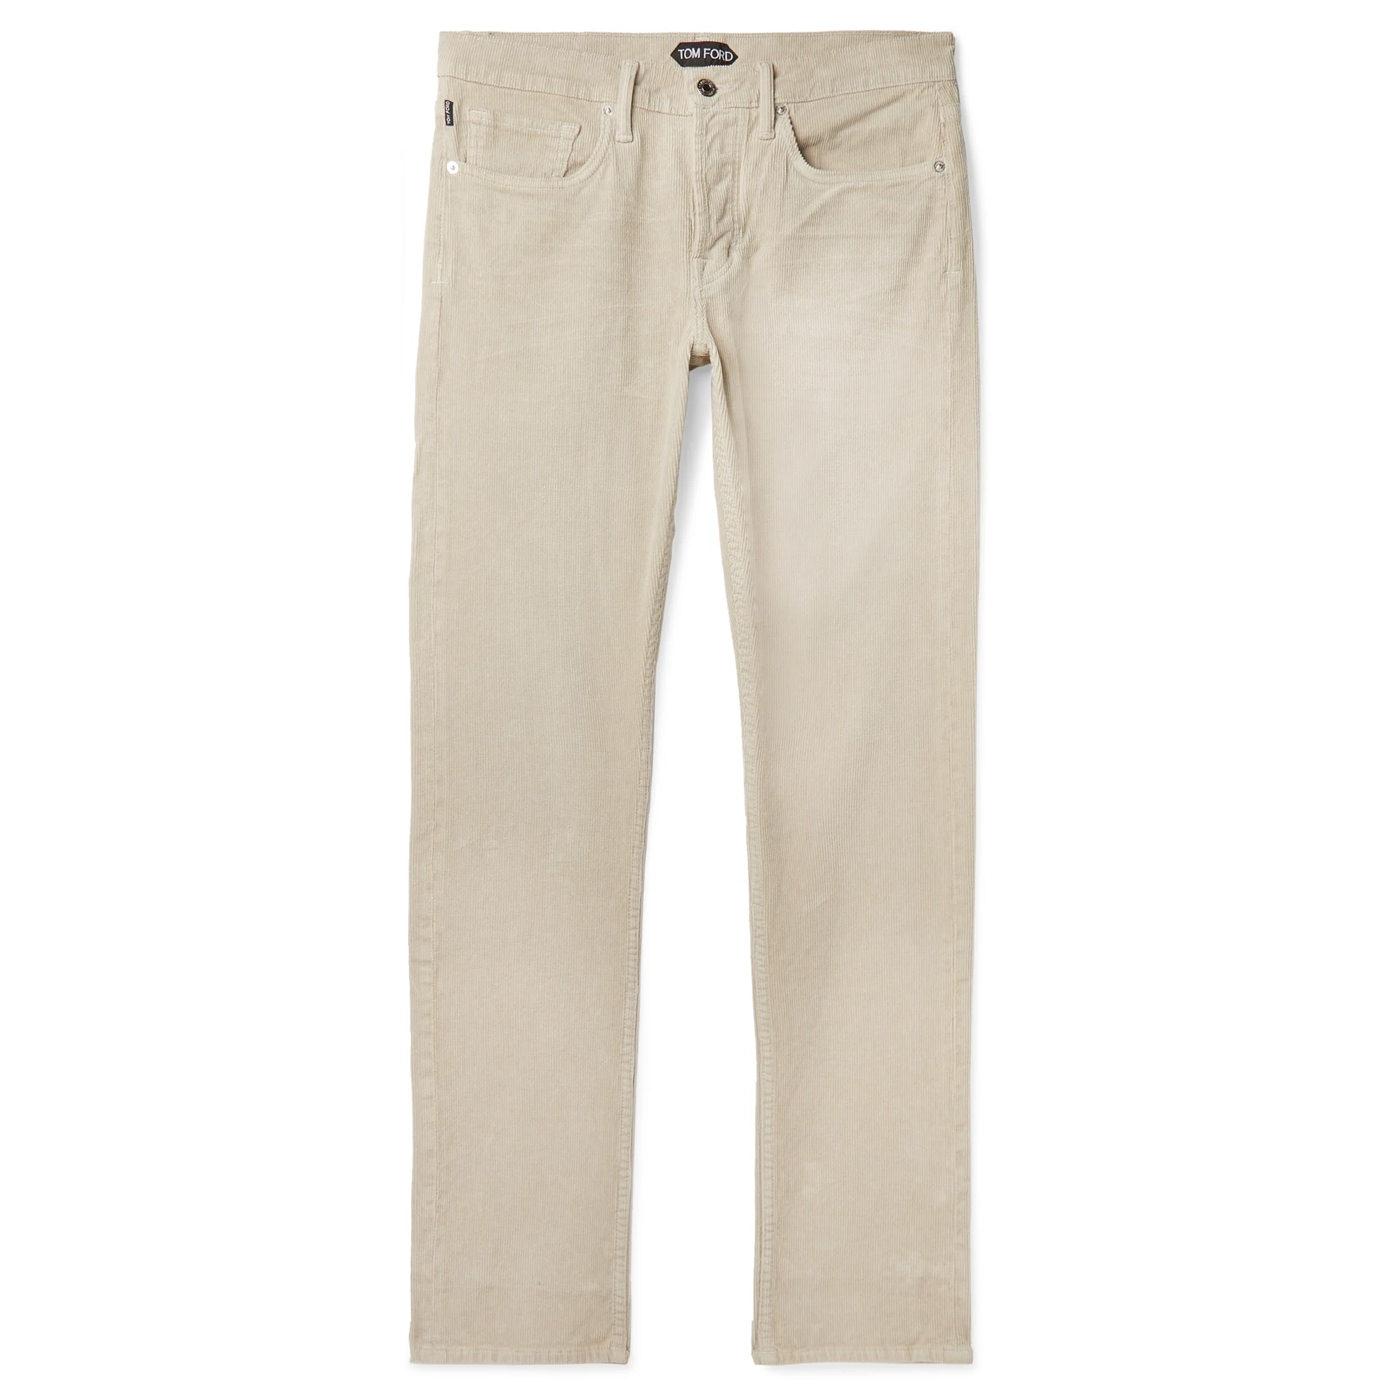 Style Mr Porter Pantalon Slim Fit Tom Ford